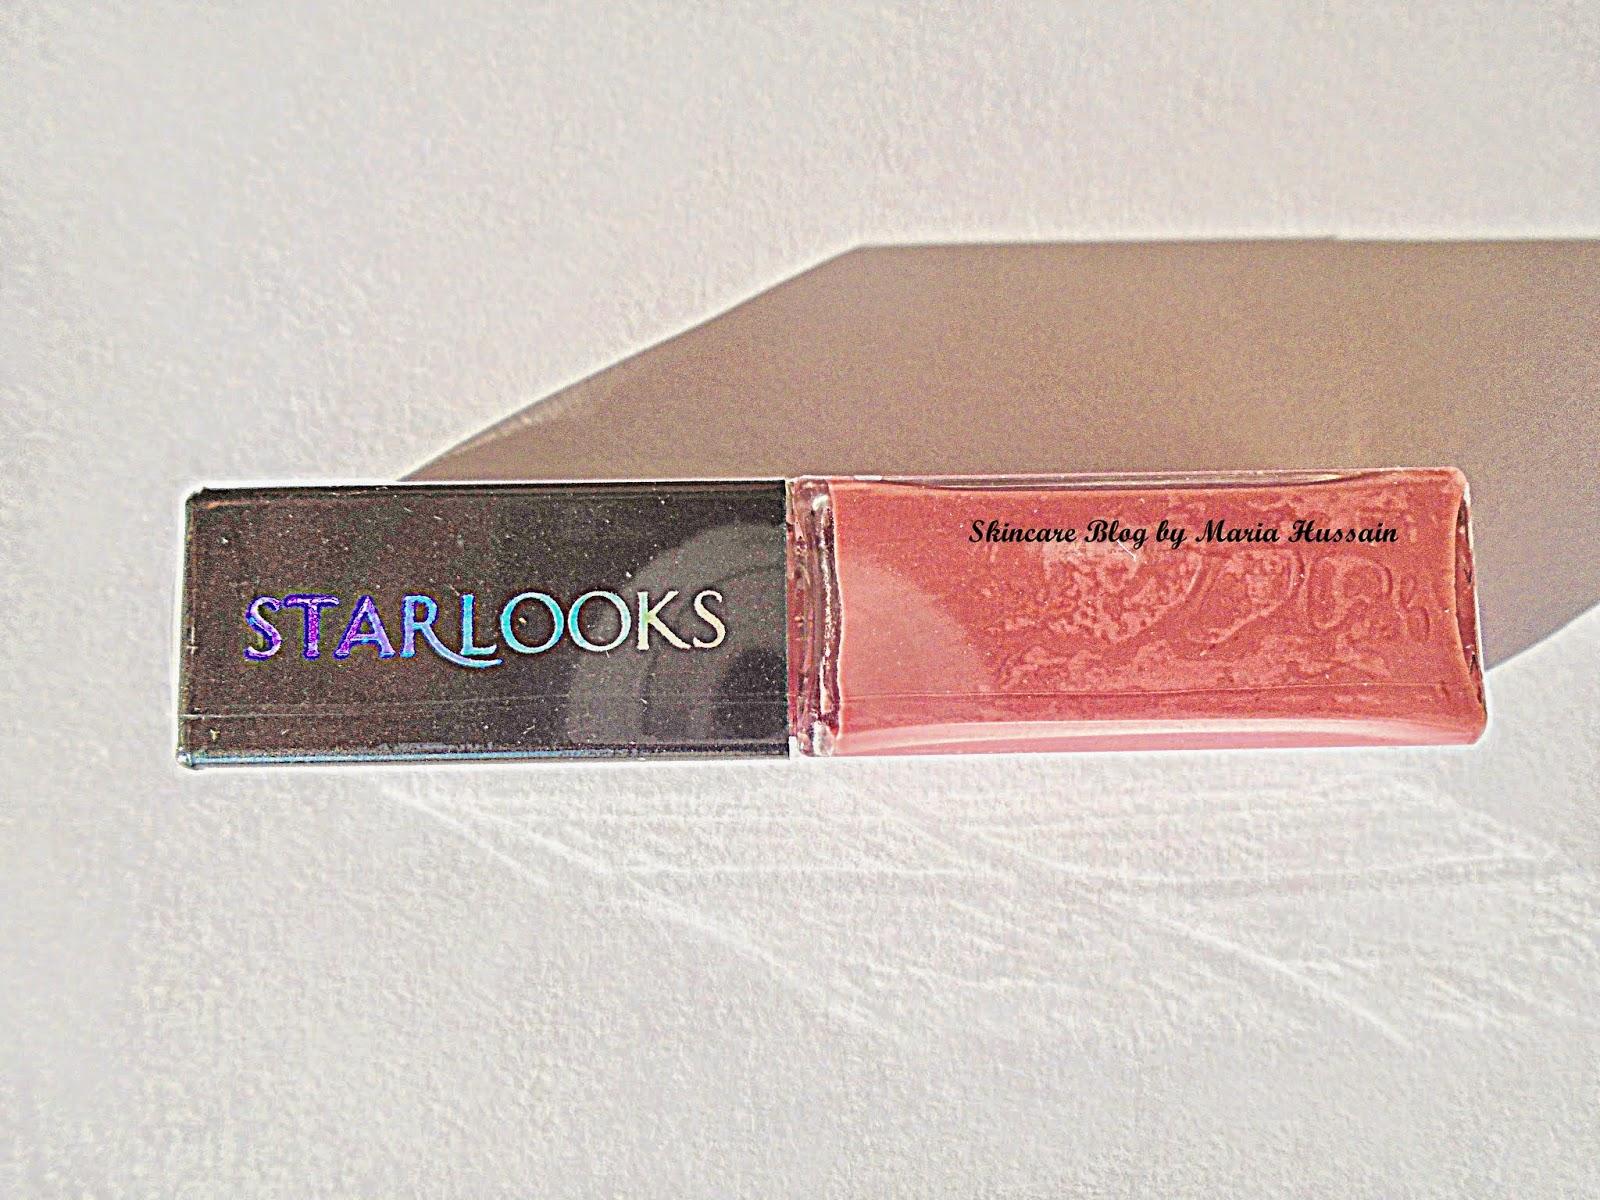 Ipsy glam bag october 2014 skin care blog by maria hussain for Skone tattooed eyeliner